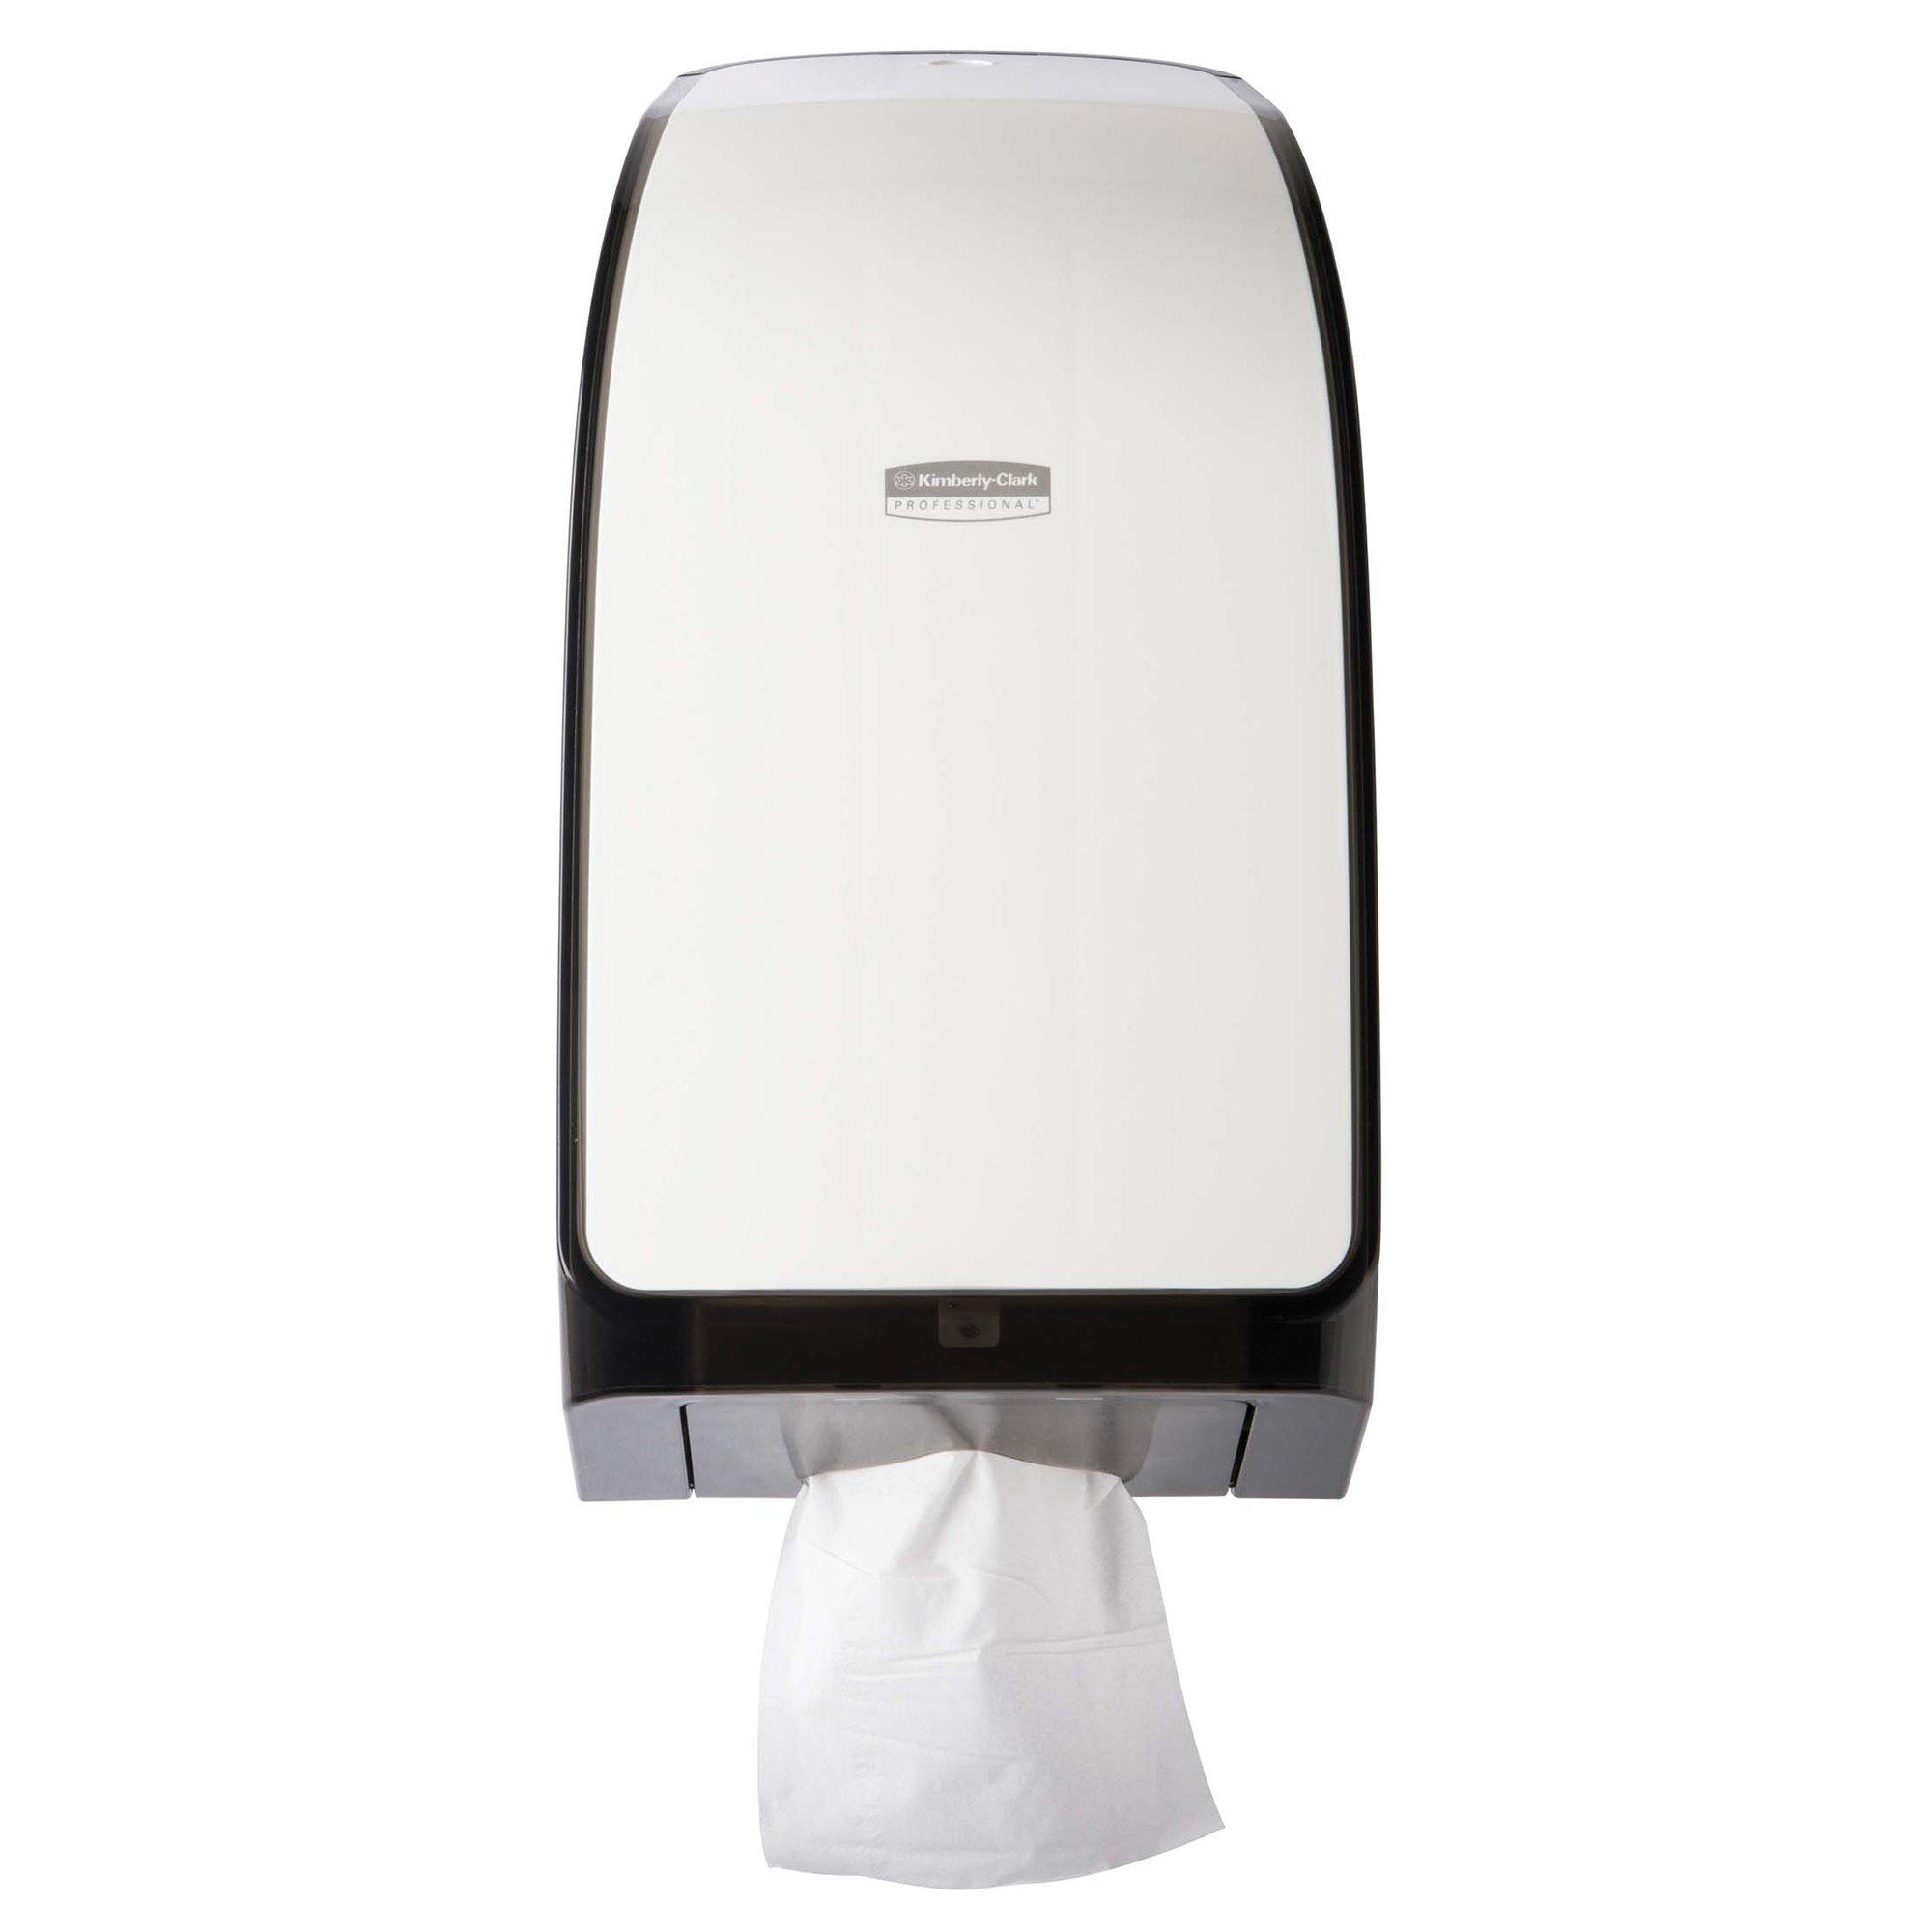 "Kimberly Clark Professional MOD Hygienic Bathroom Tissue Dispenser (40407), 7.0"" x 5.725"" x 13.339"", for Scott & Cottonelle Toilet Paper, White, 1 / Case"